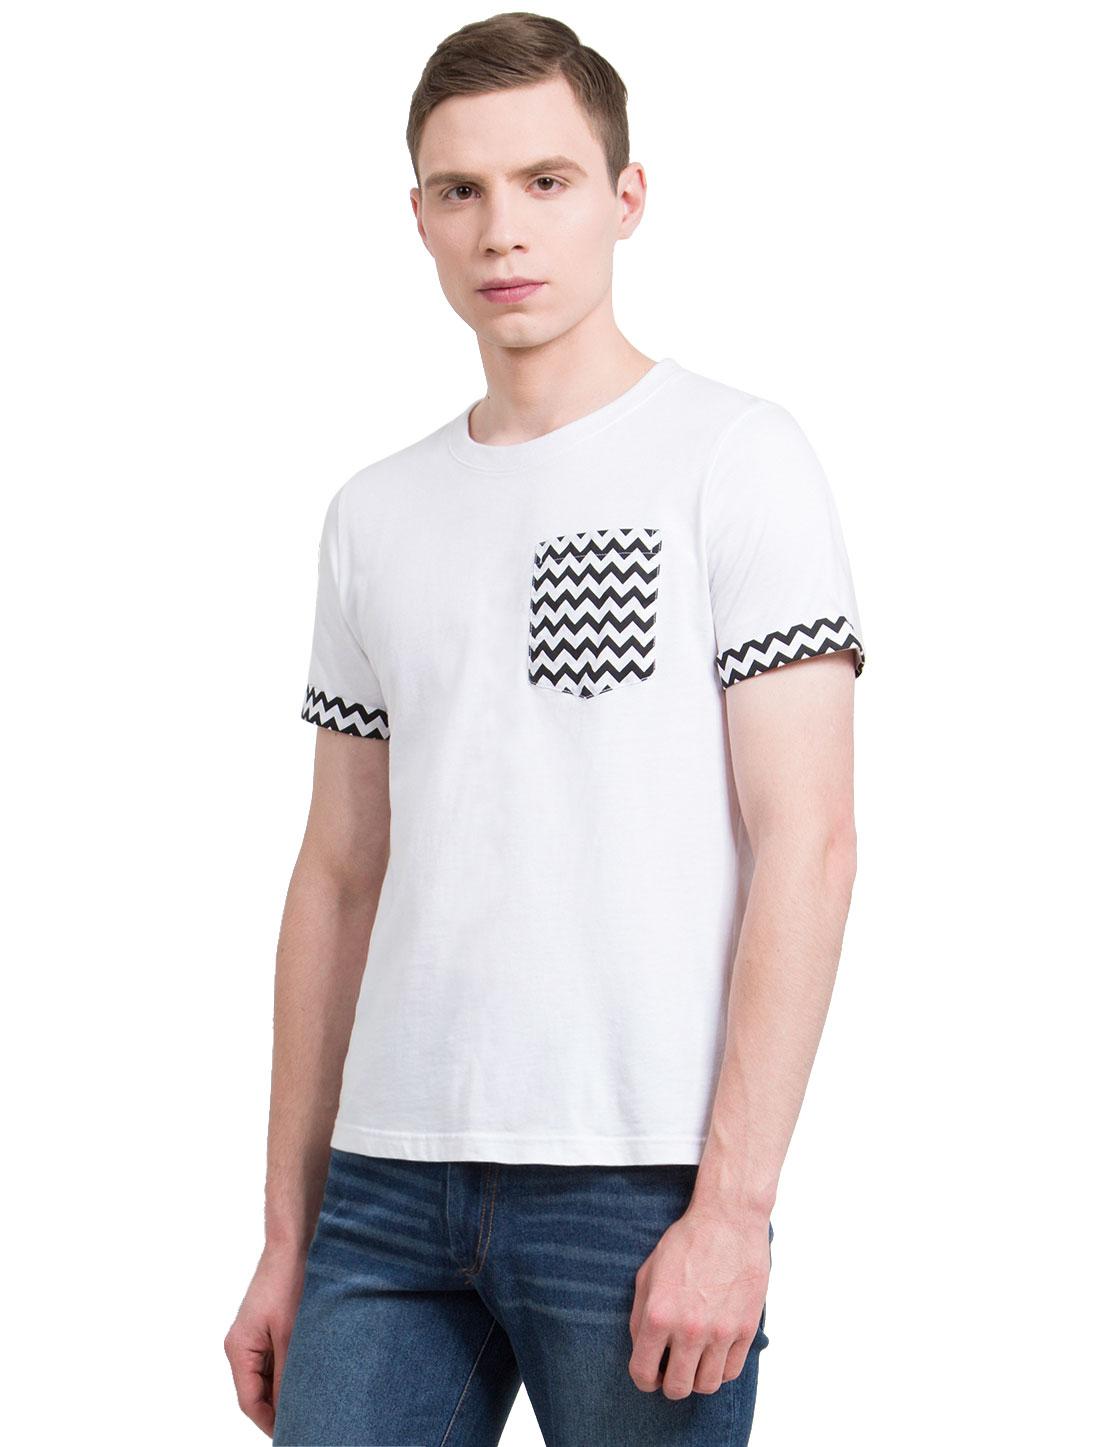 Men Crew Neck Short Sleeves Chevron Print Cotton T-Shirt White S